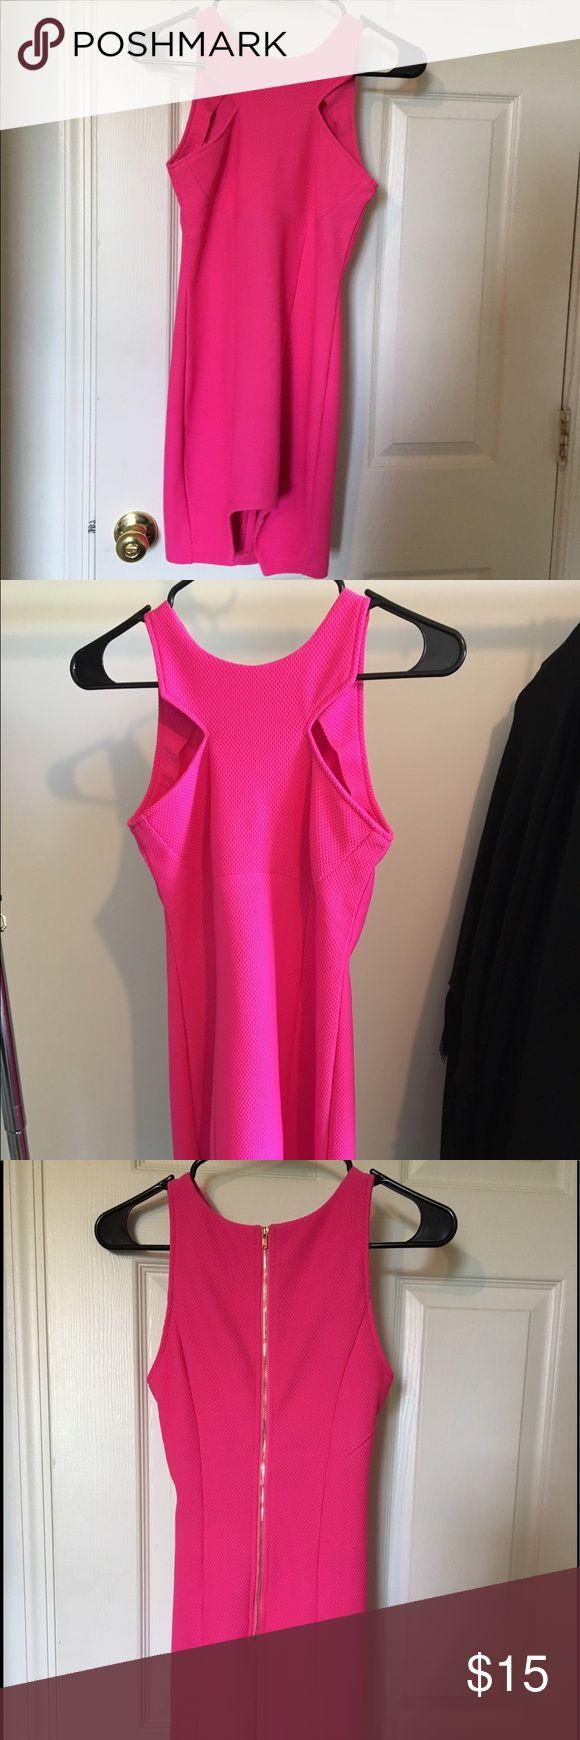 Pink Bodycon Dress Bright pink cotton Bodycon Dress with mesh-like fabric xenia Dresses Mini